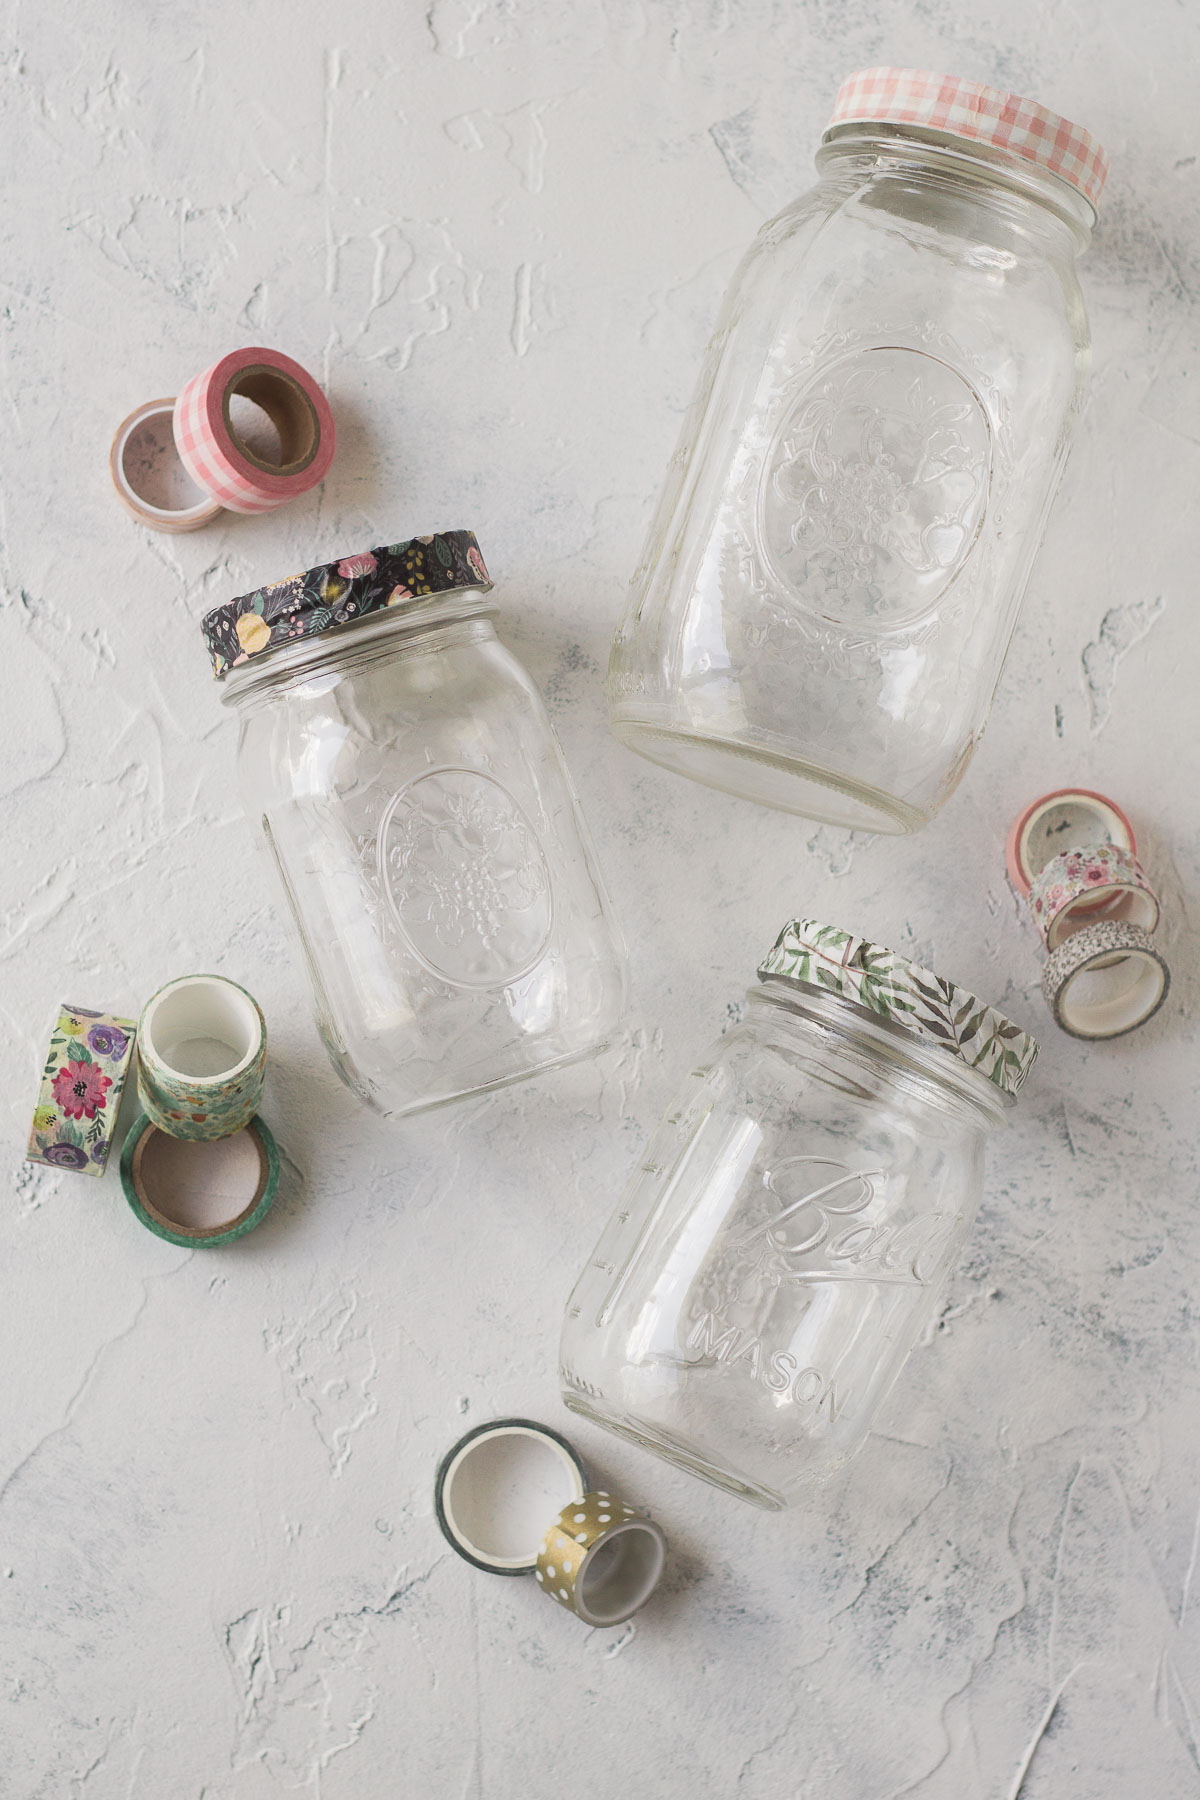 Three glass jars decorated with washi tape.